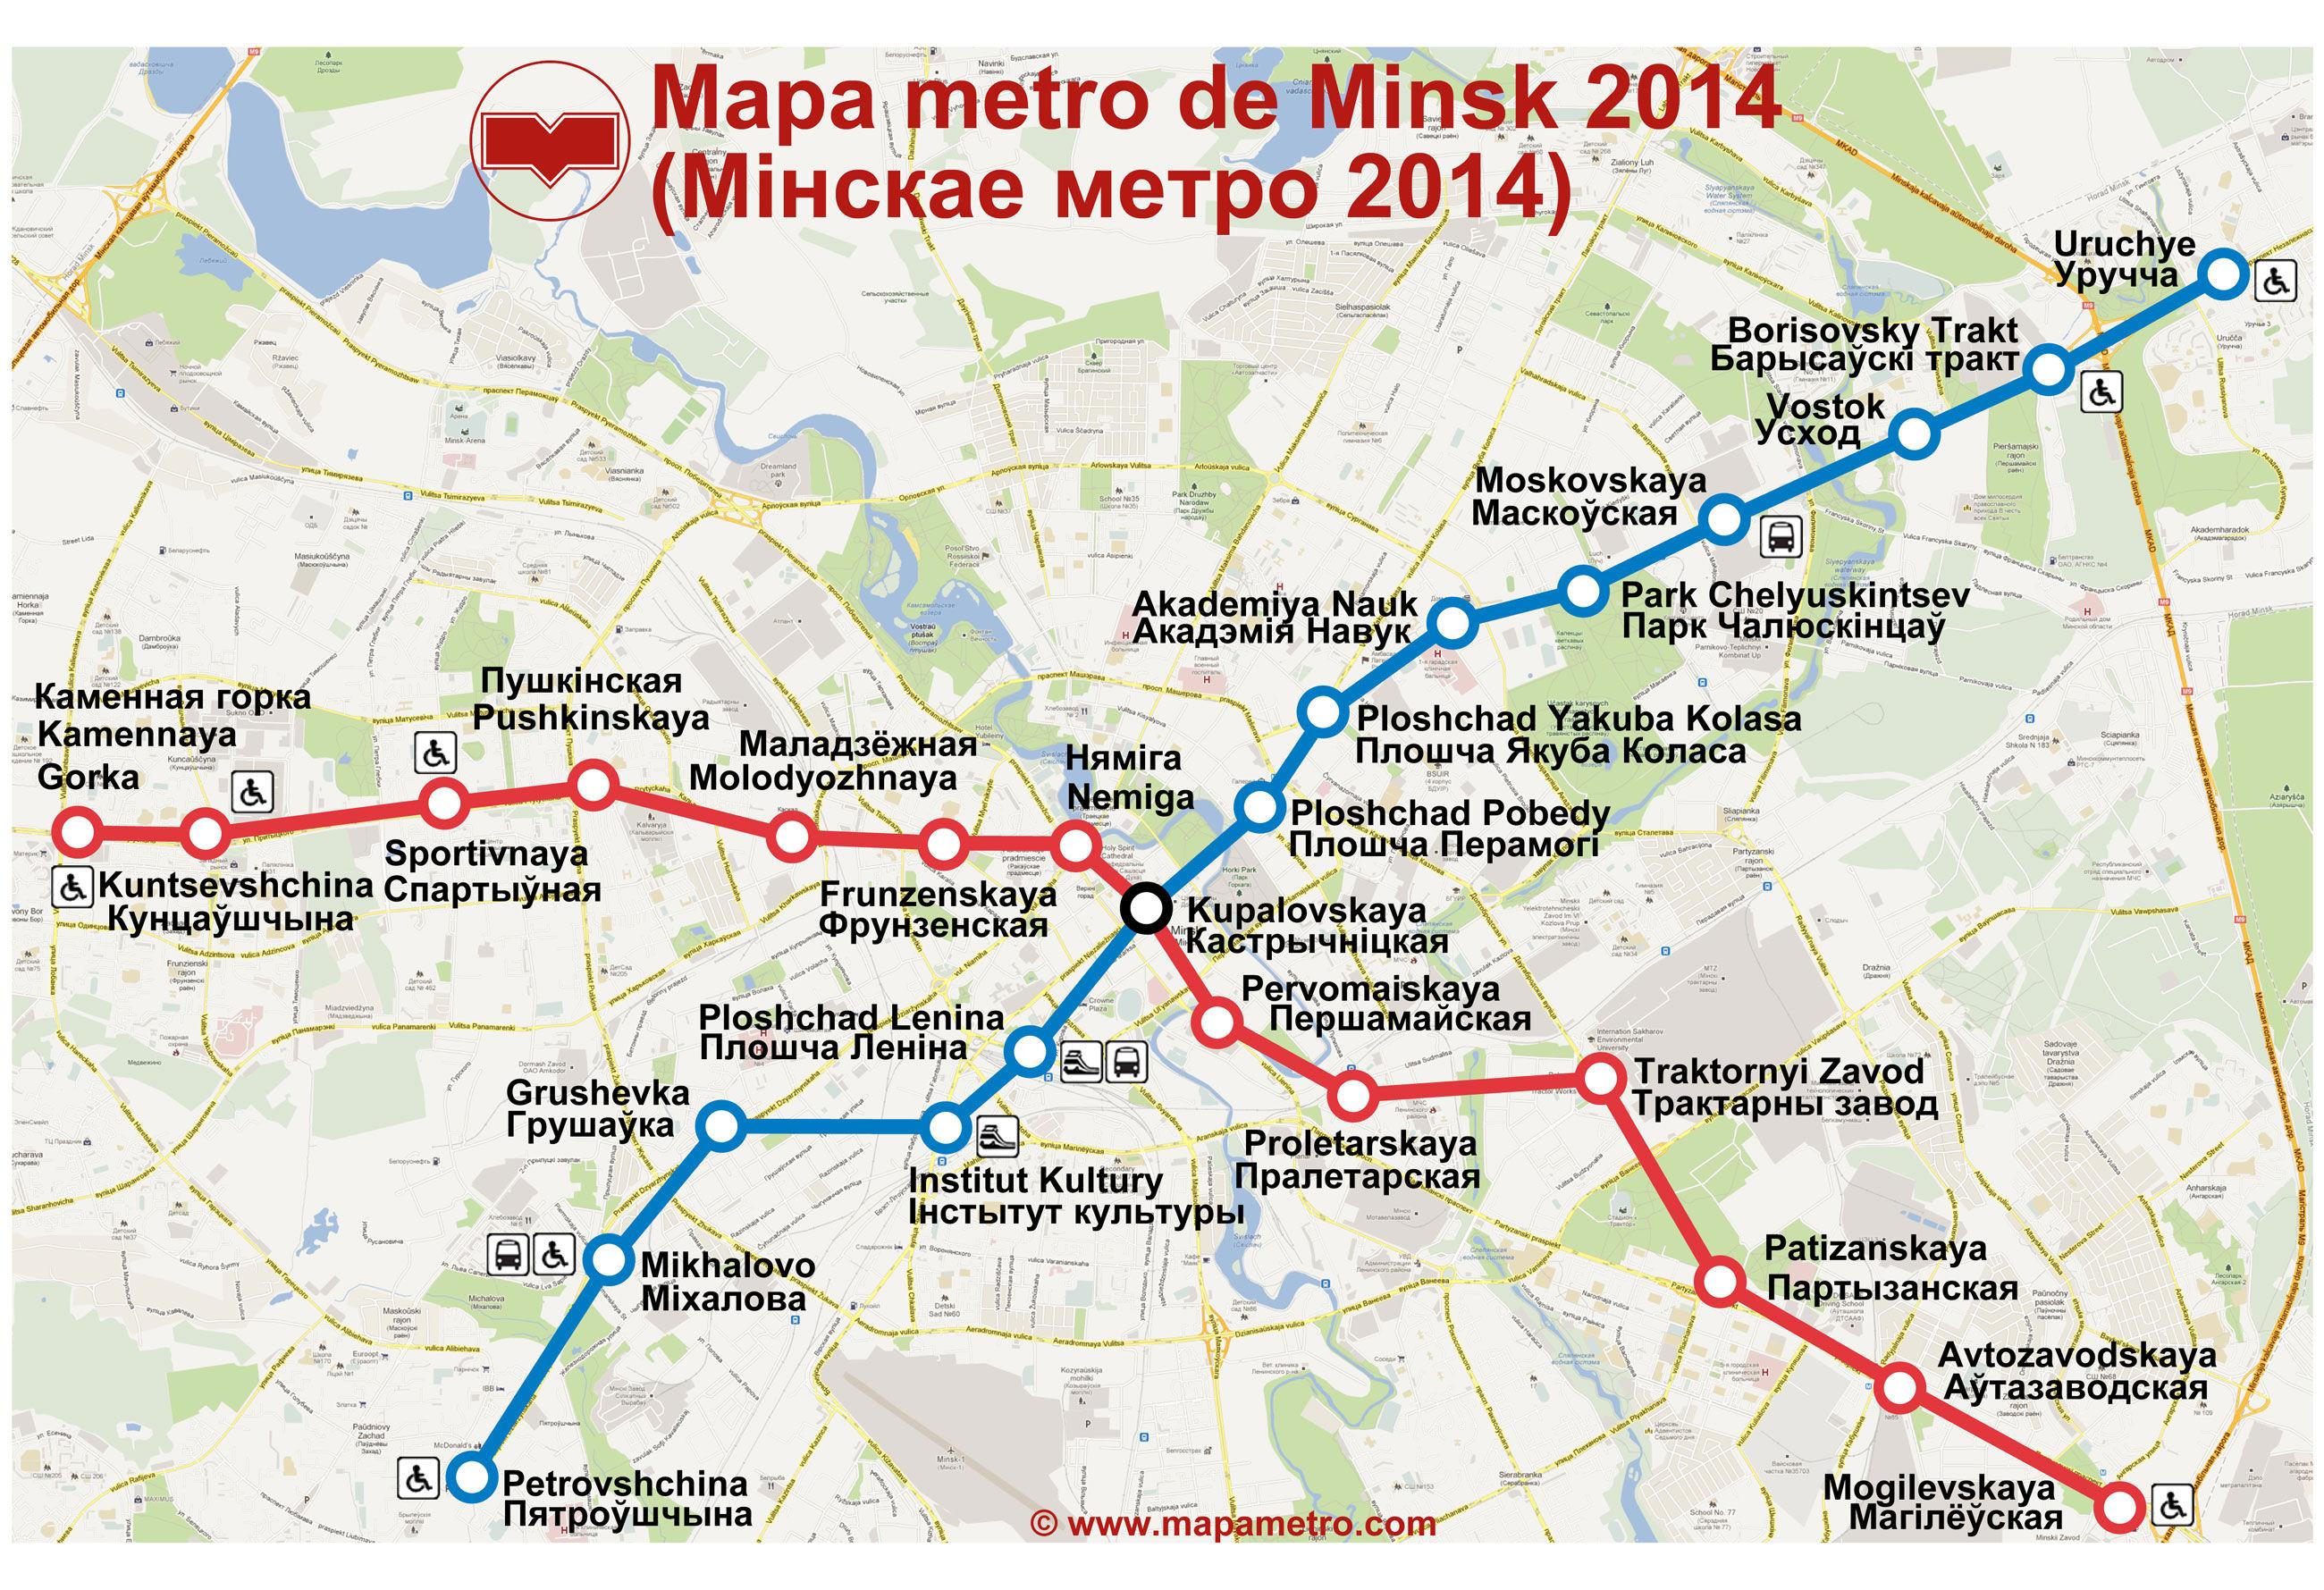 Chile Subway Map.Map Subway Of Minsk